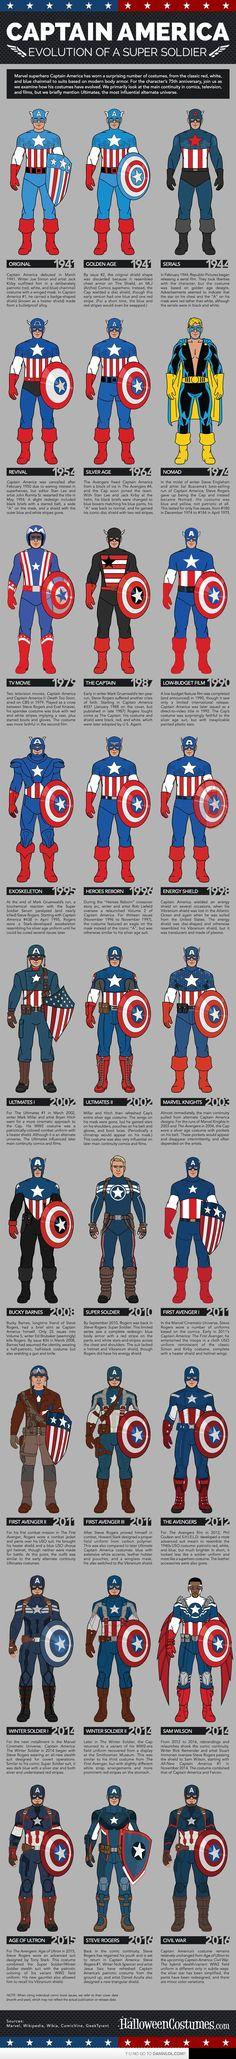 The Evolution Of Captain America's Costume In Comic & Film.